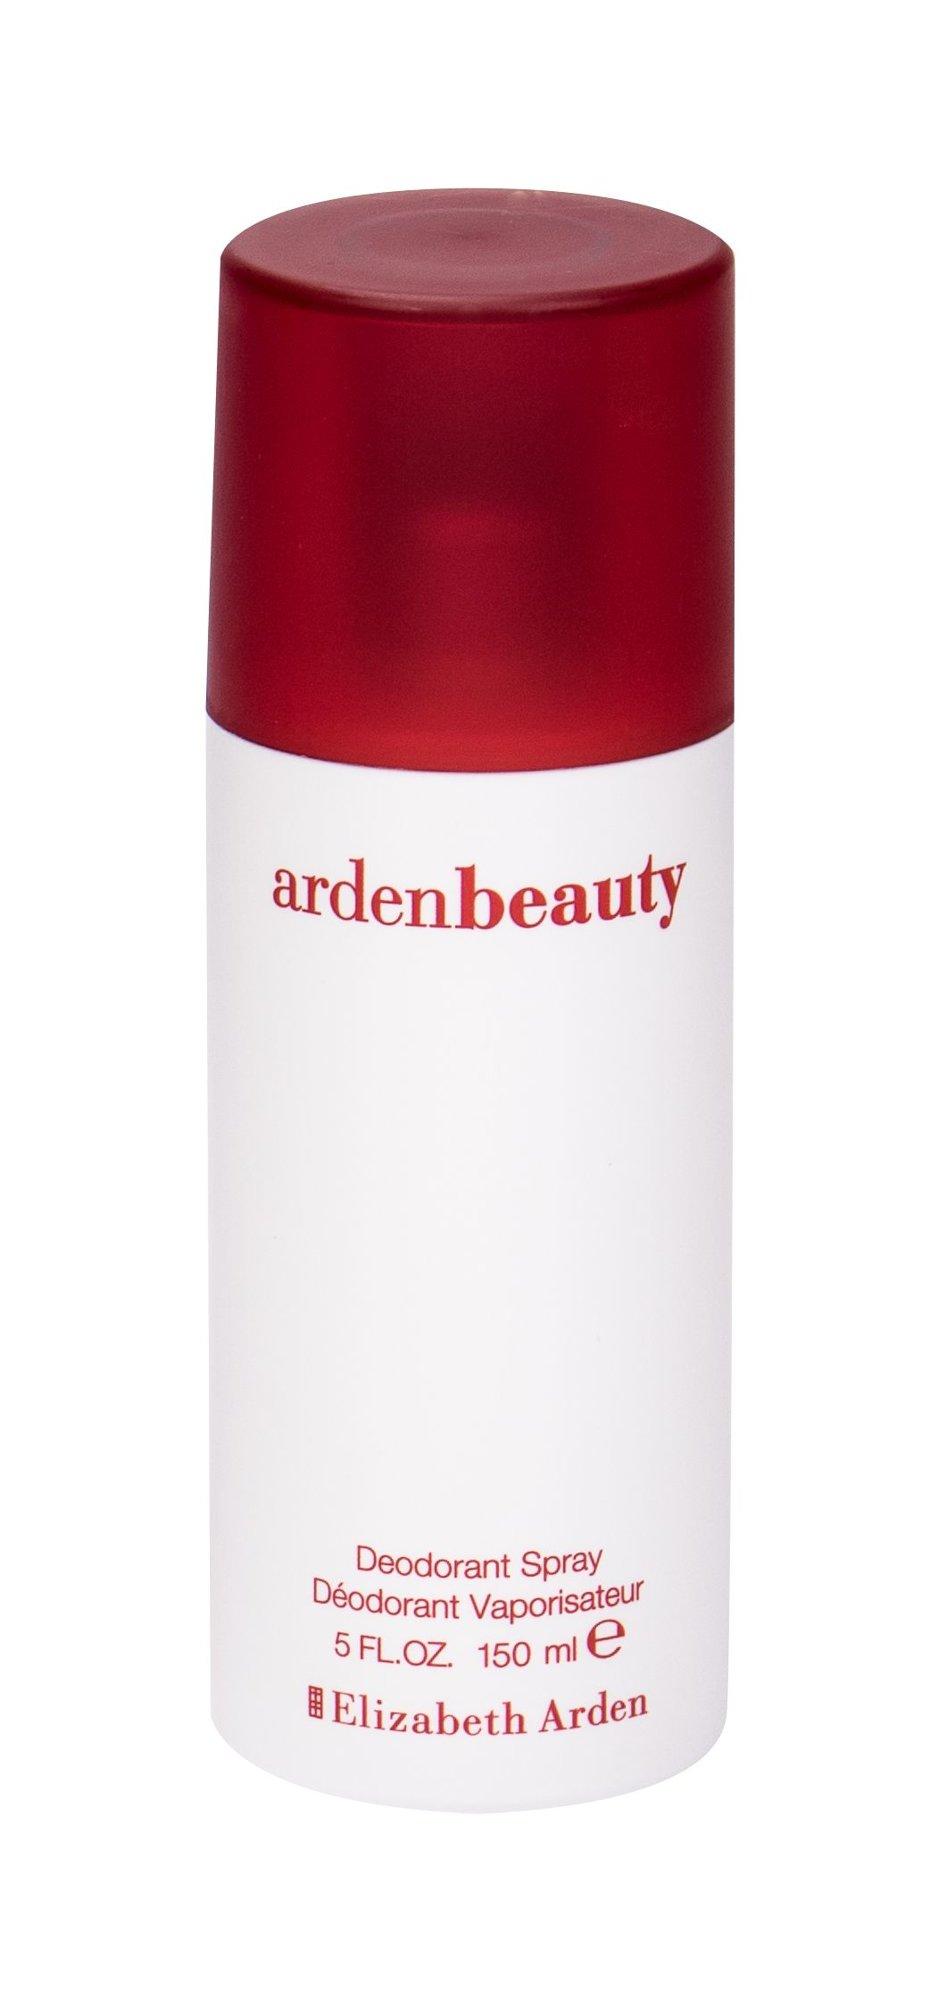 Elizabeth Arden Beauty Deodorant 150ml